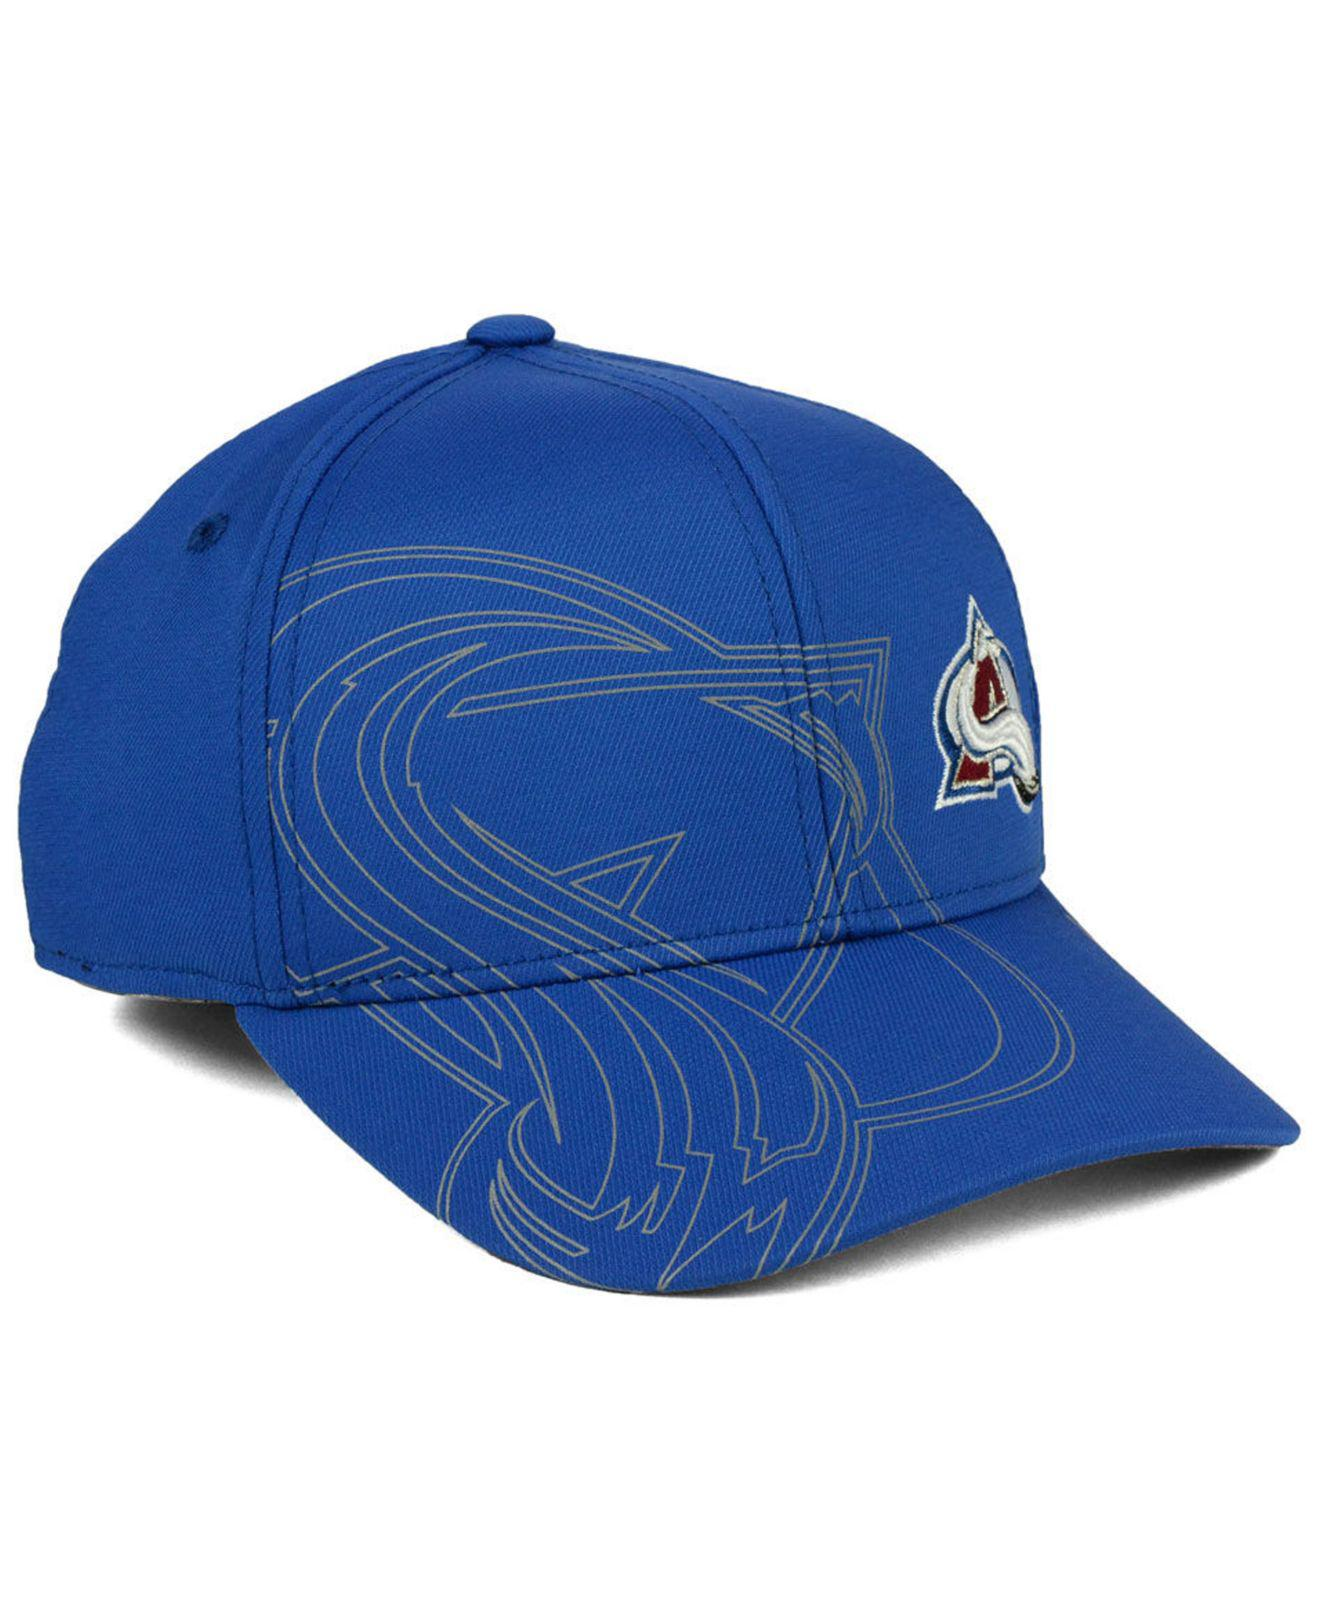 426d357c48f28 ... discount lyst adidas colorado avalanche 2nd season flex cap in blue for  men 3cf53 b561a